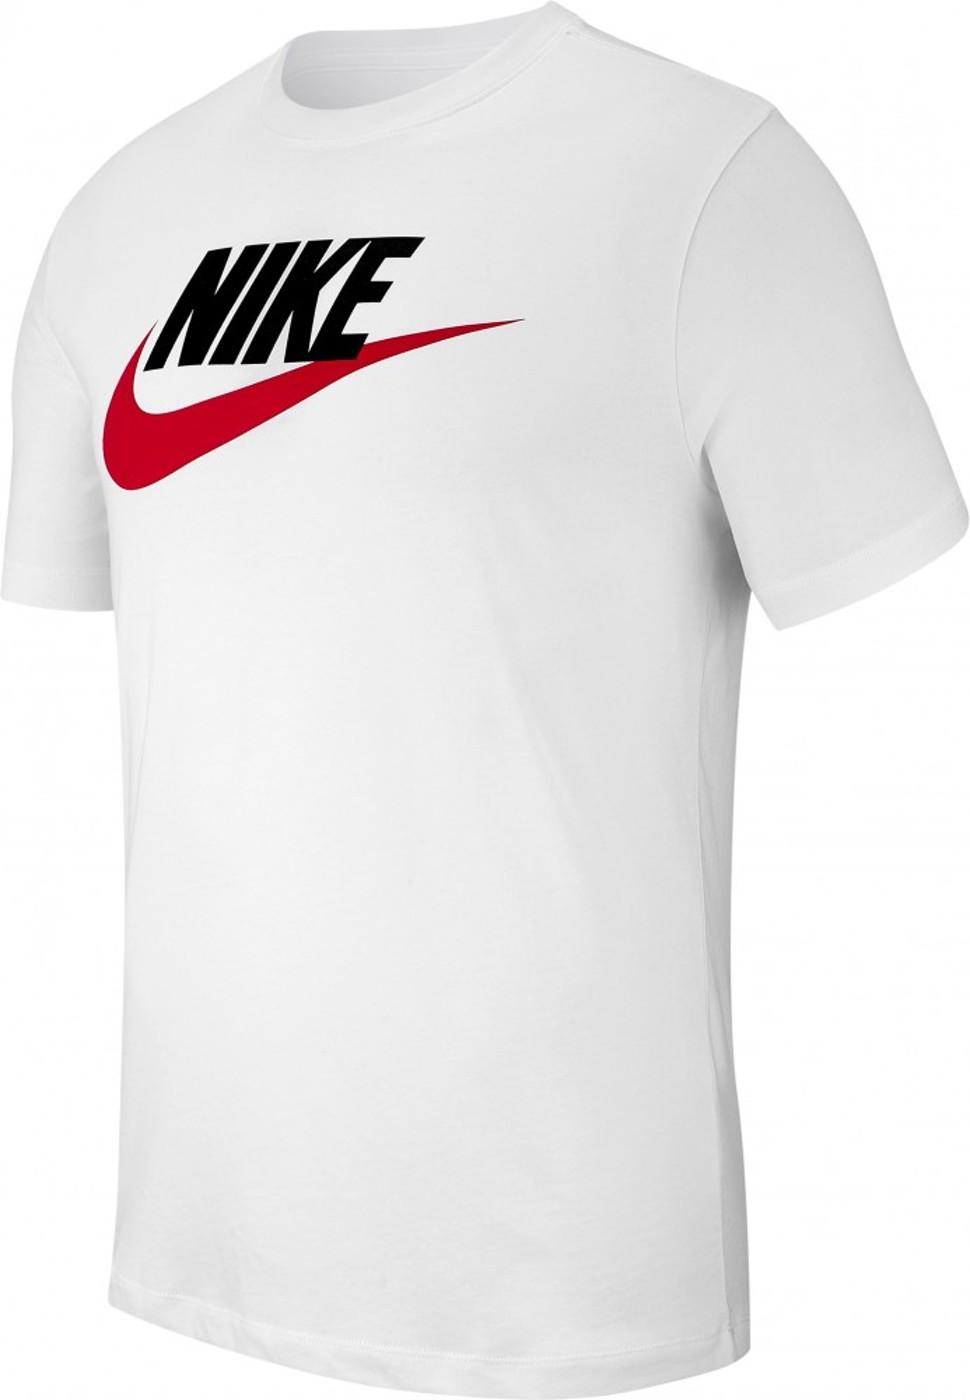 Nike Sportswear T-Shirt - Herren